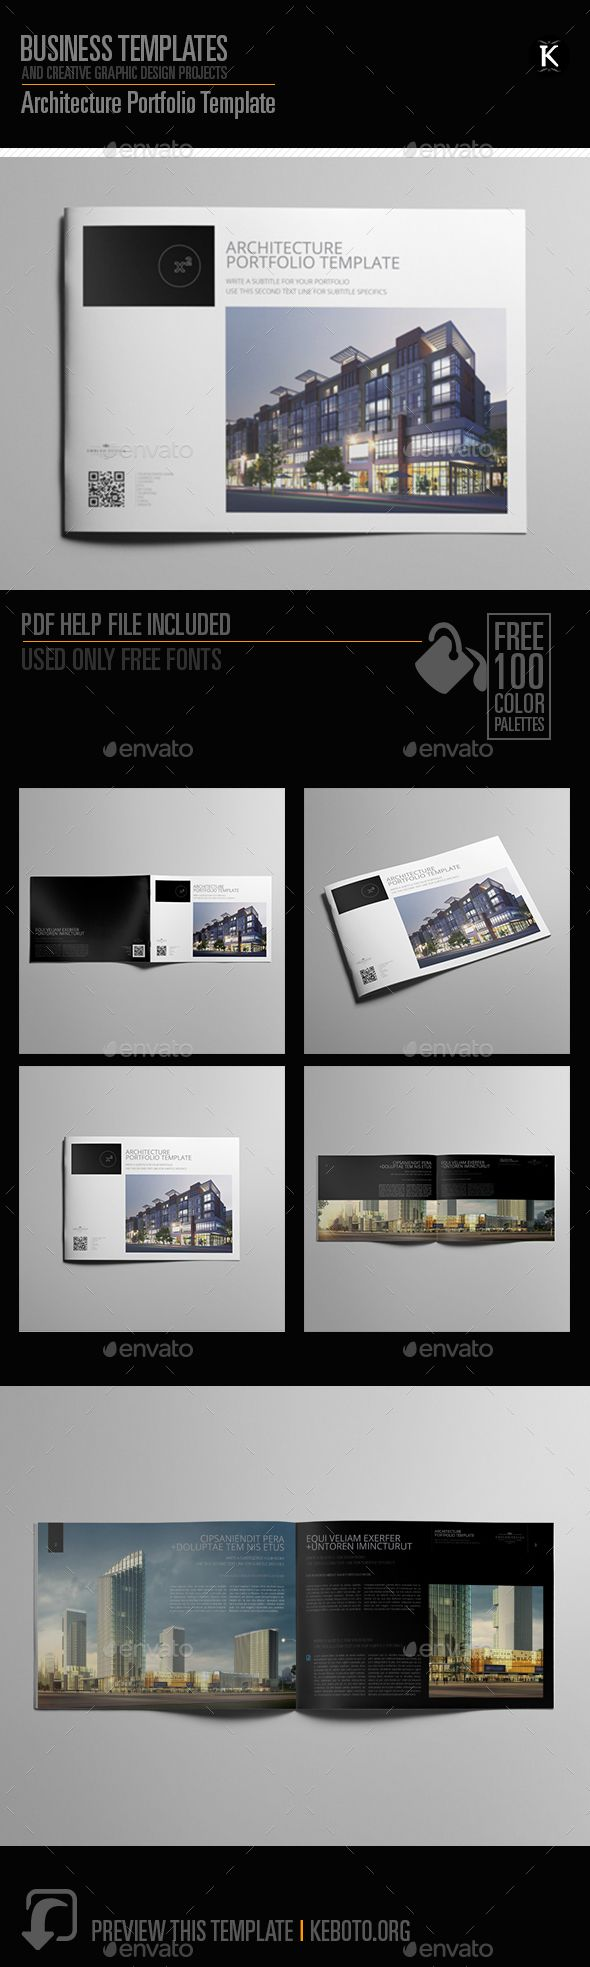 Architecture Portfolio Template | Fonts-logos-icons | Pinterest